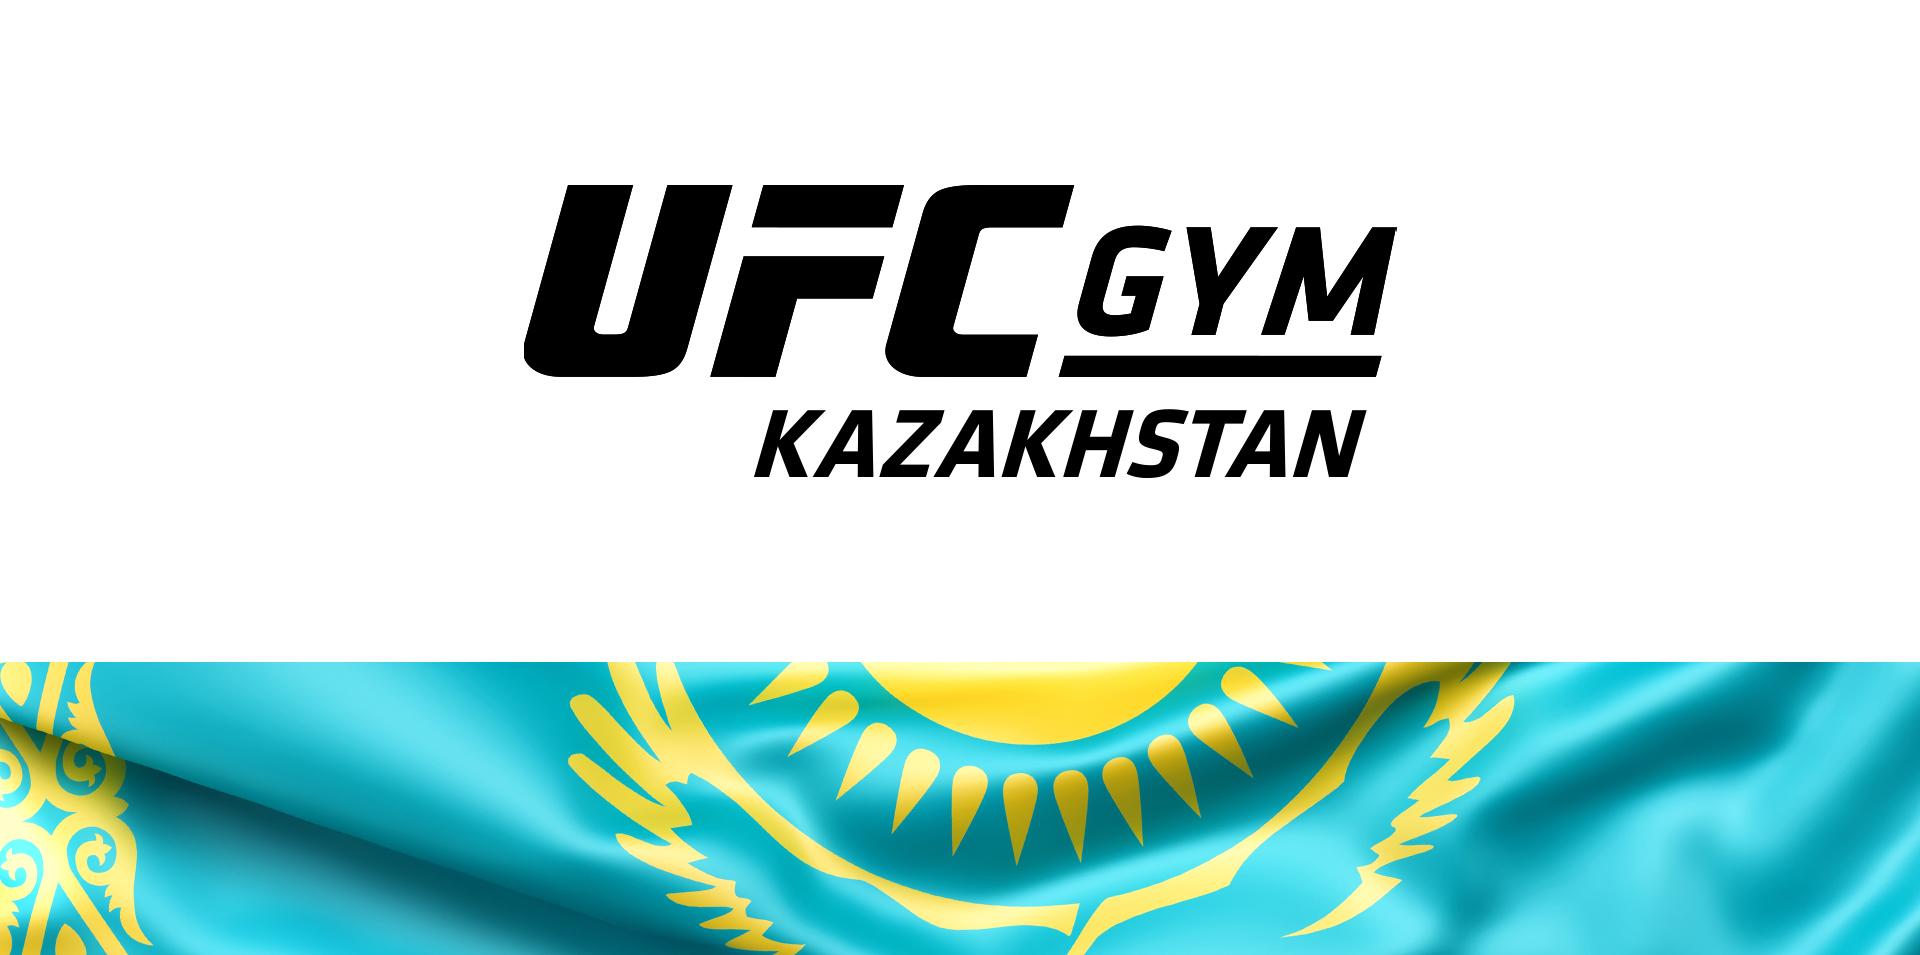 Kazakhstan Featured Image